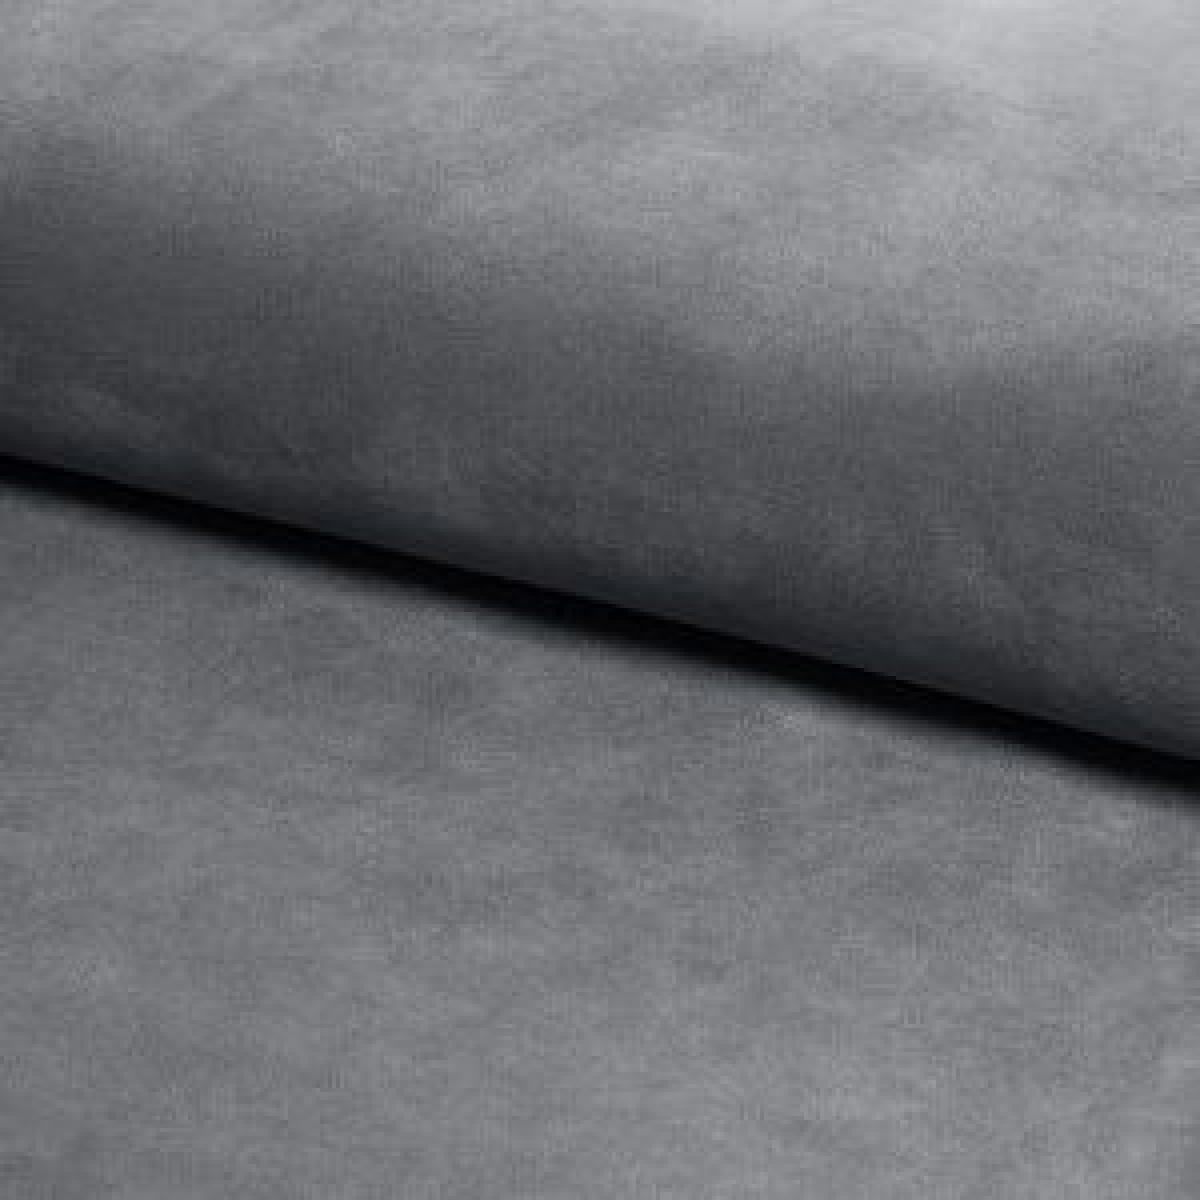 Próbnik tkaniny BLUVEL BL14 ciemno szary